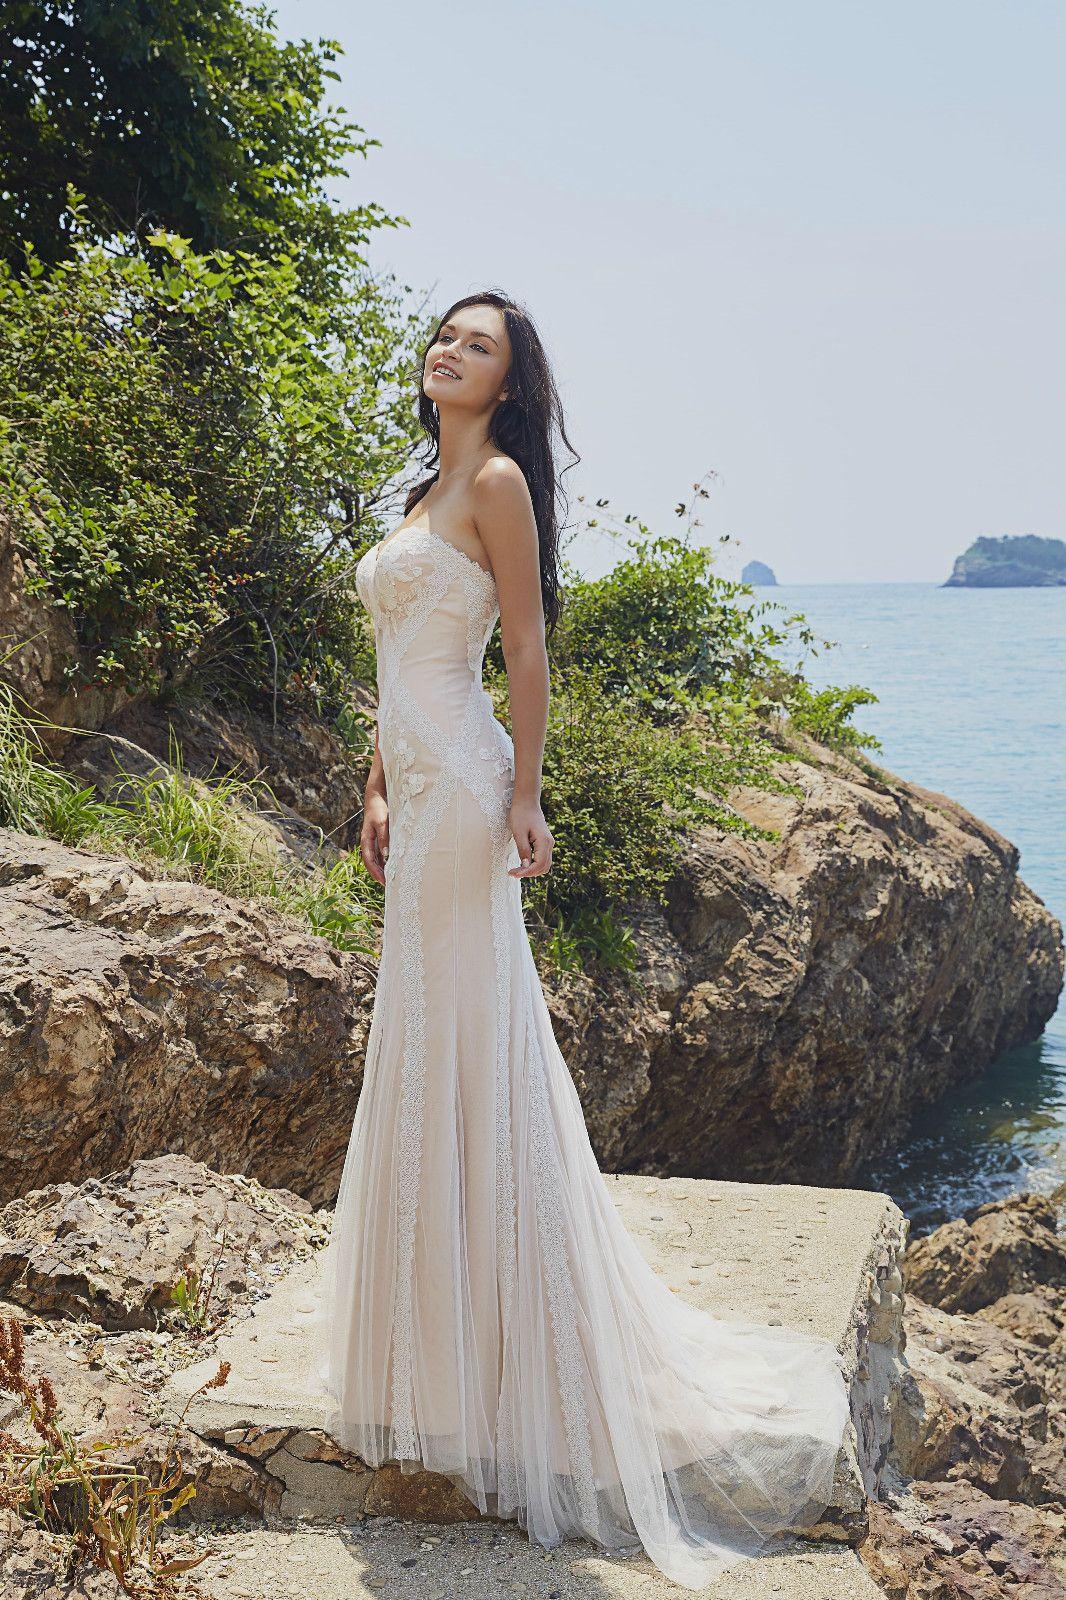 Devon - BRIDAL - Chic Nostalgia - Bohemian and Romantic Wedding ...